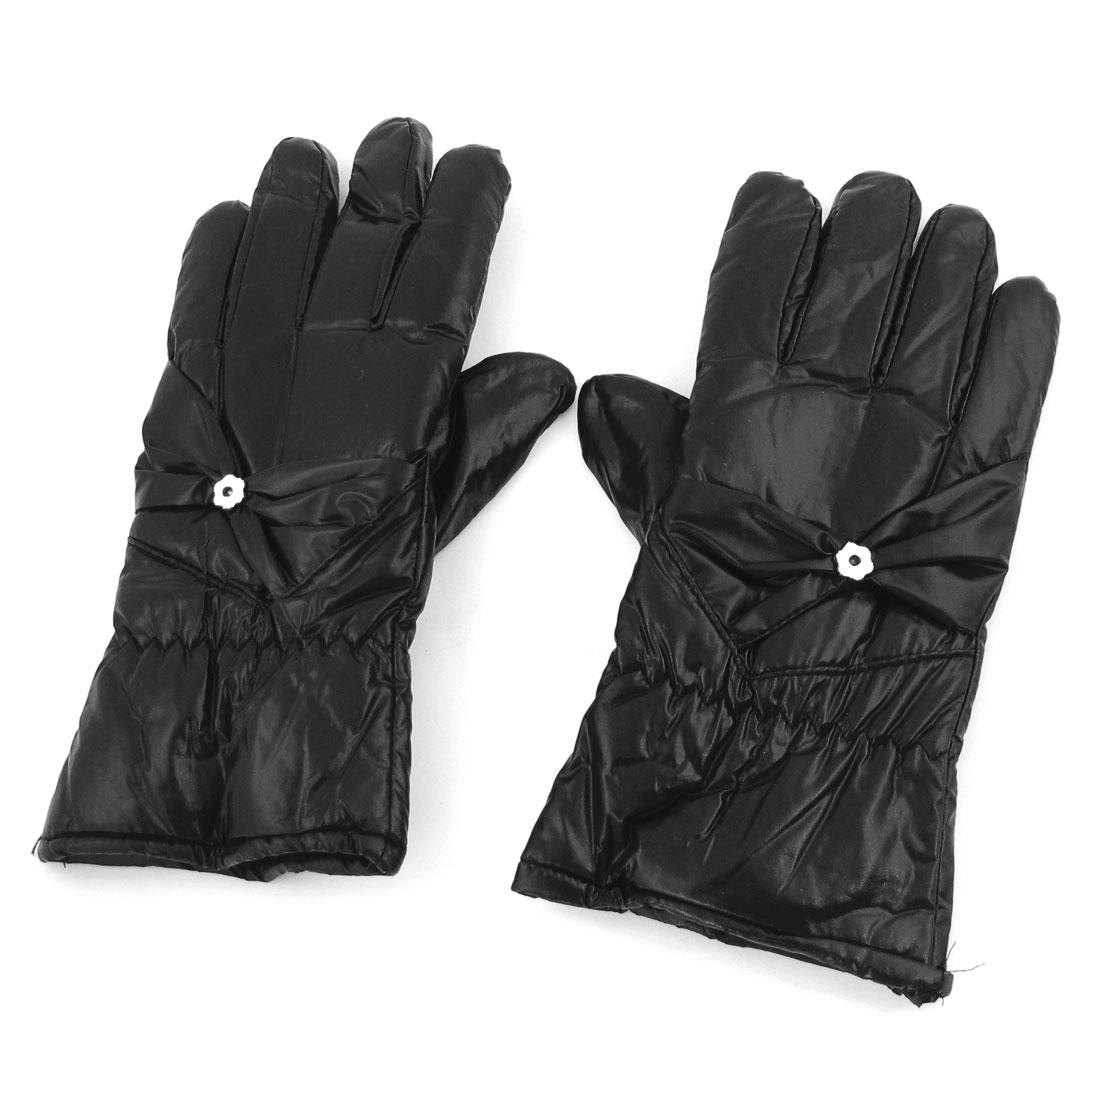 Ladies Pair Ruched Flower Decor Full Finger Winter Warm Gloves Black